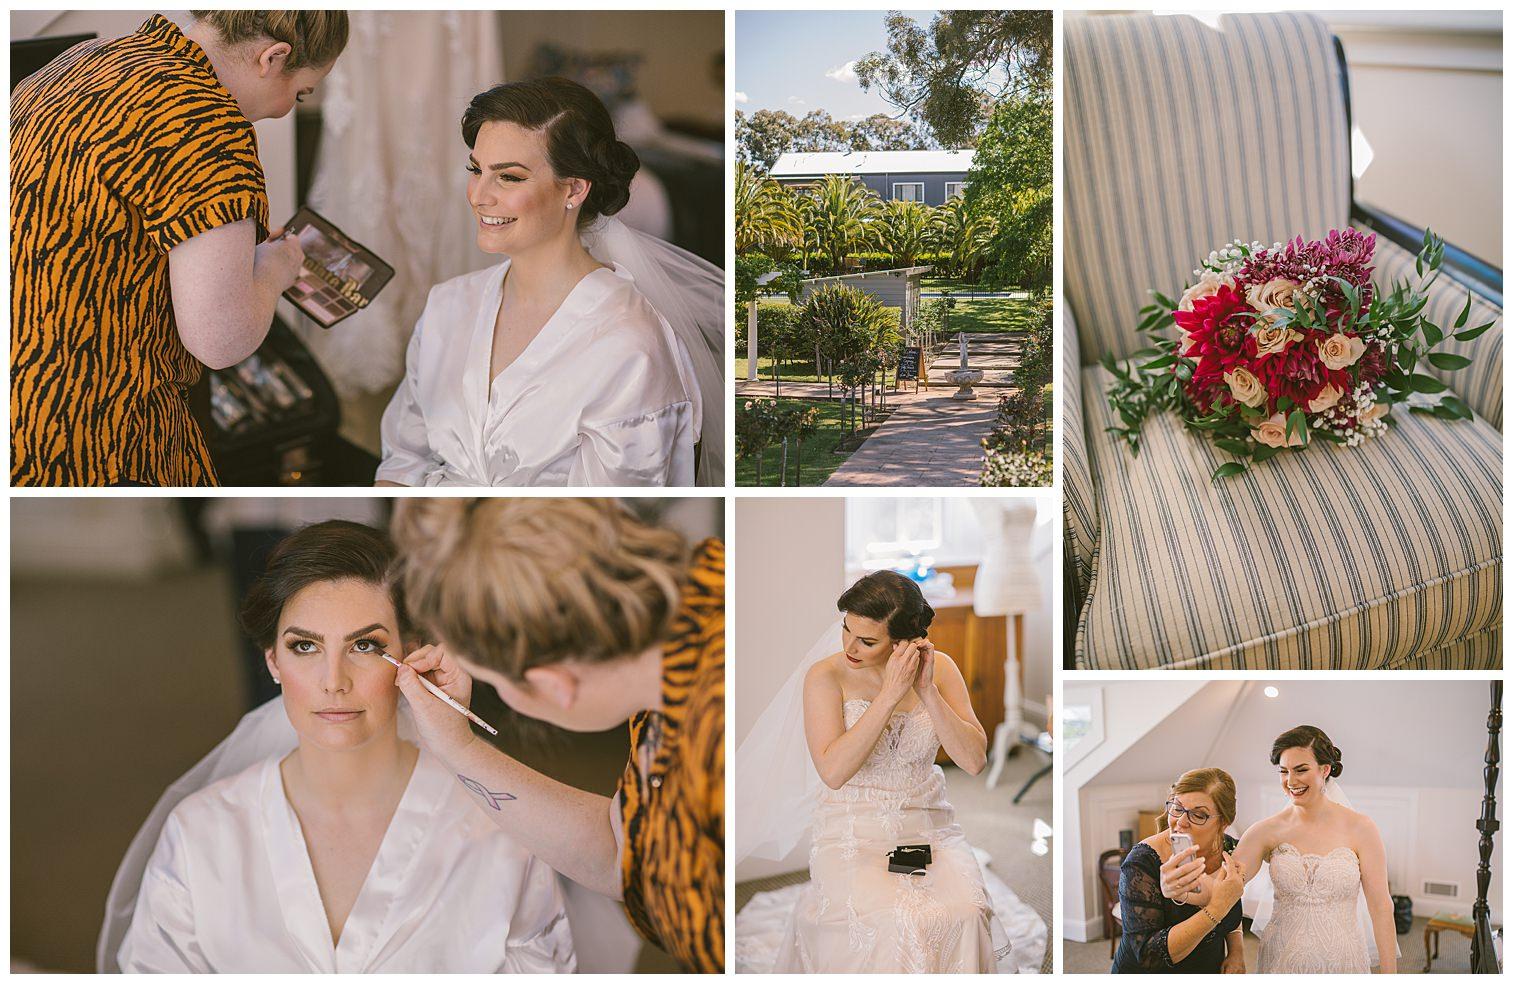 ruby oak florist, bargo, kalinya estate wedding, natural wedding photographer, southern highlands, goulburn photographer